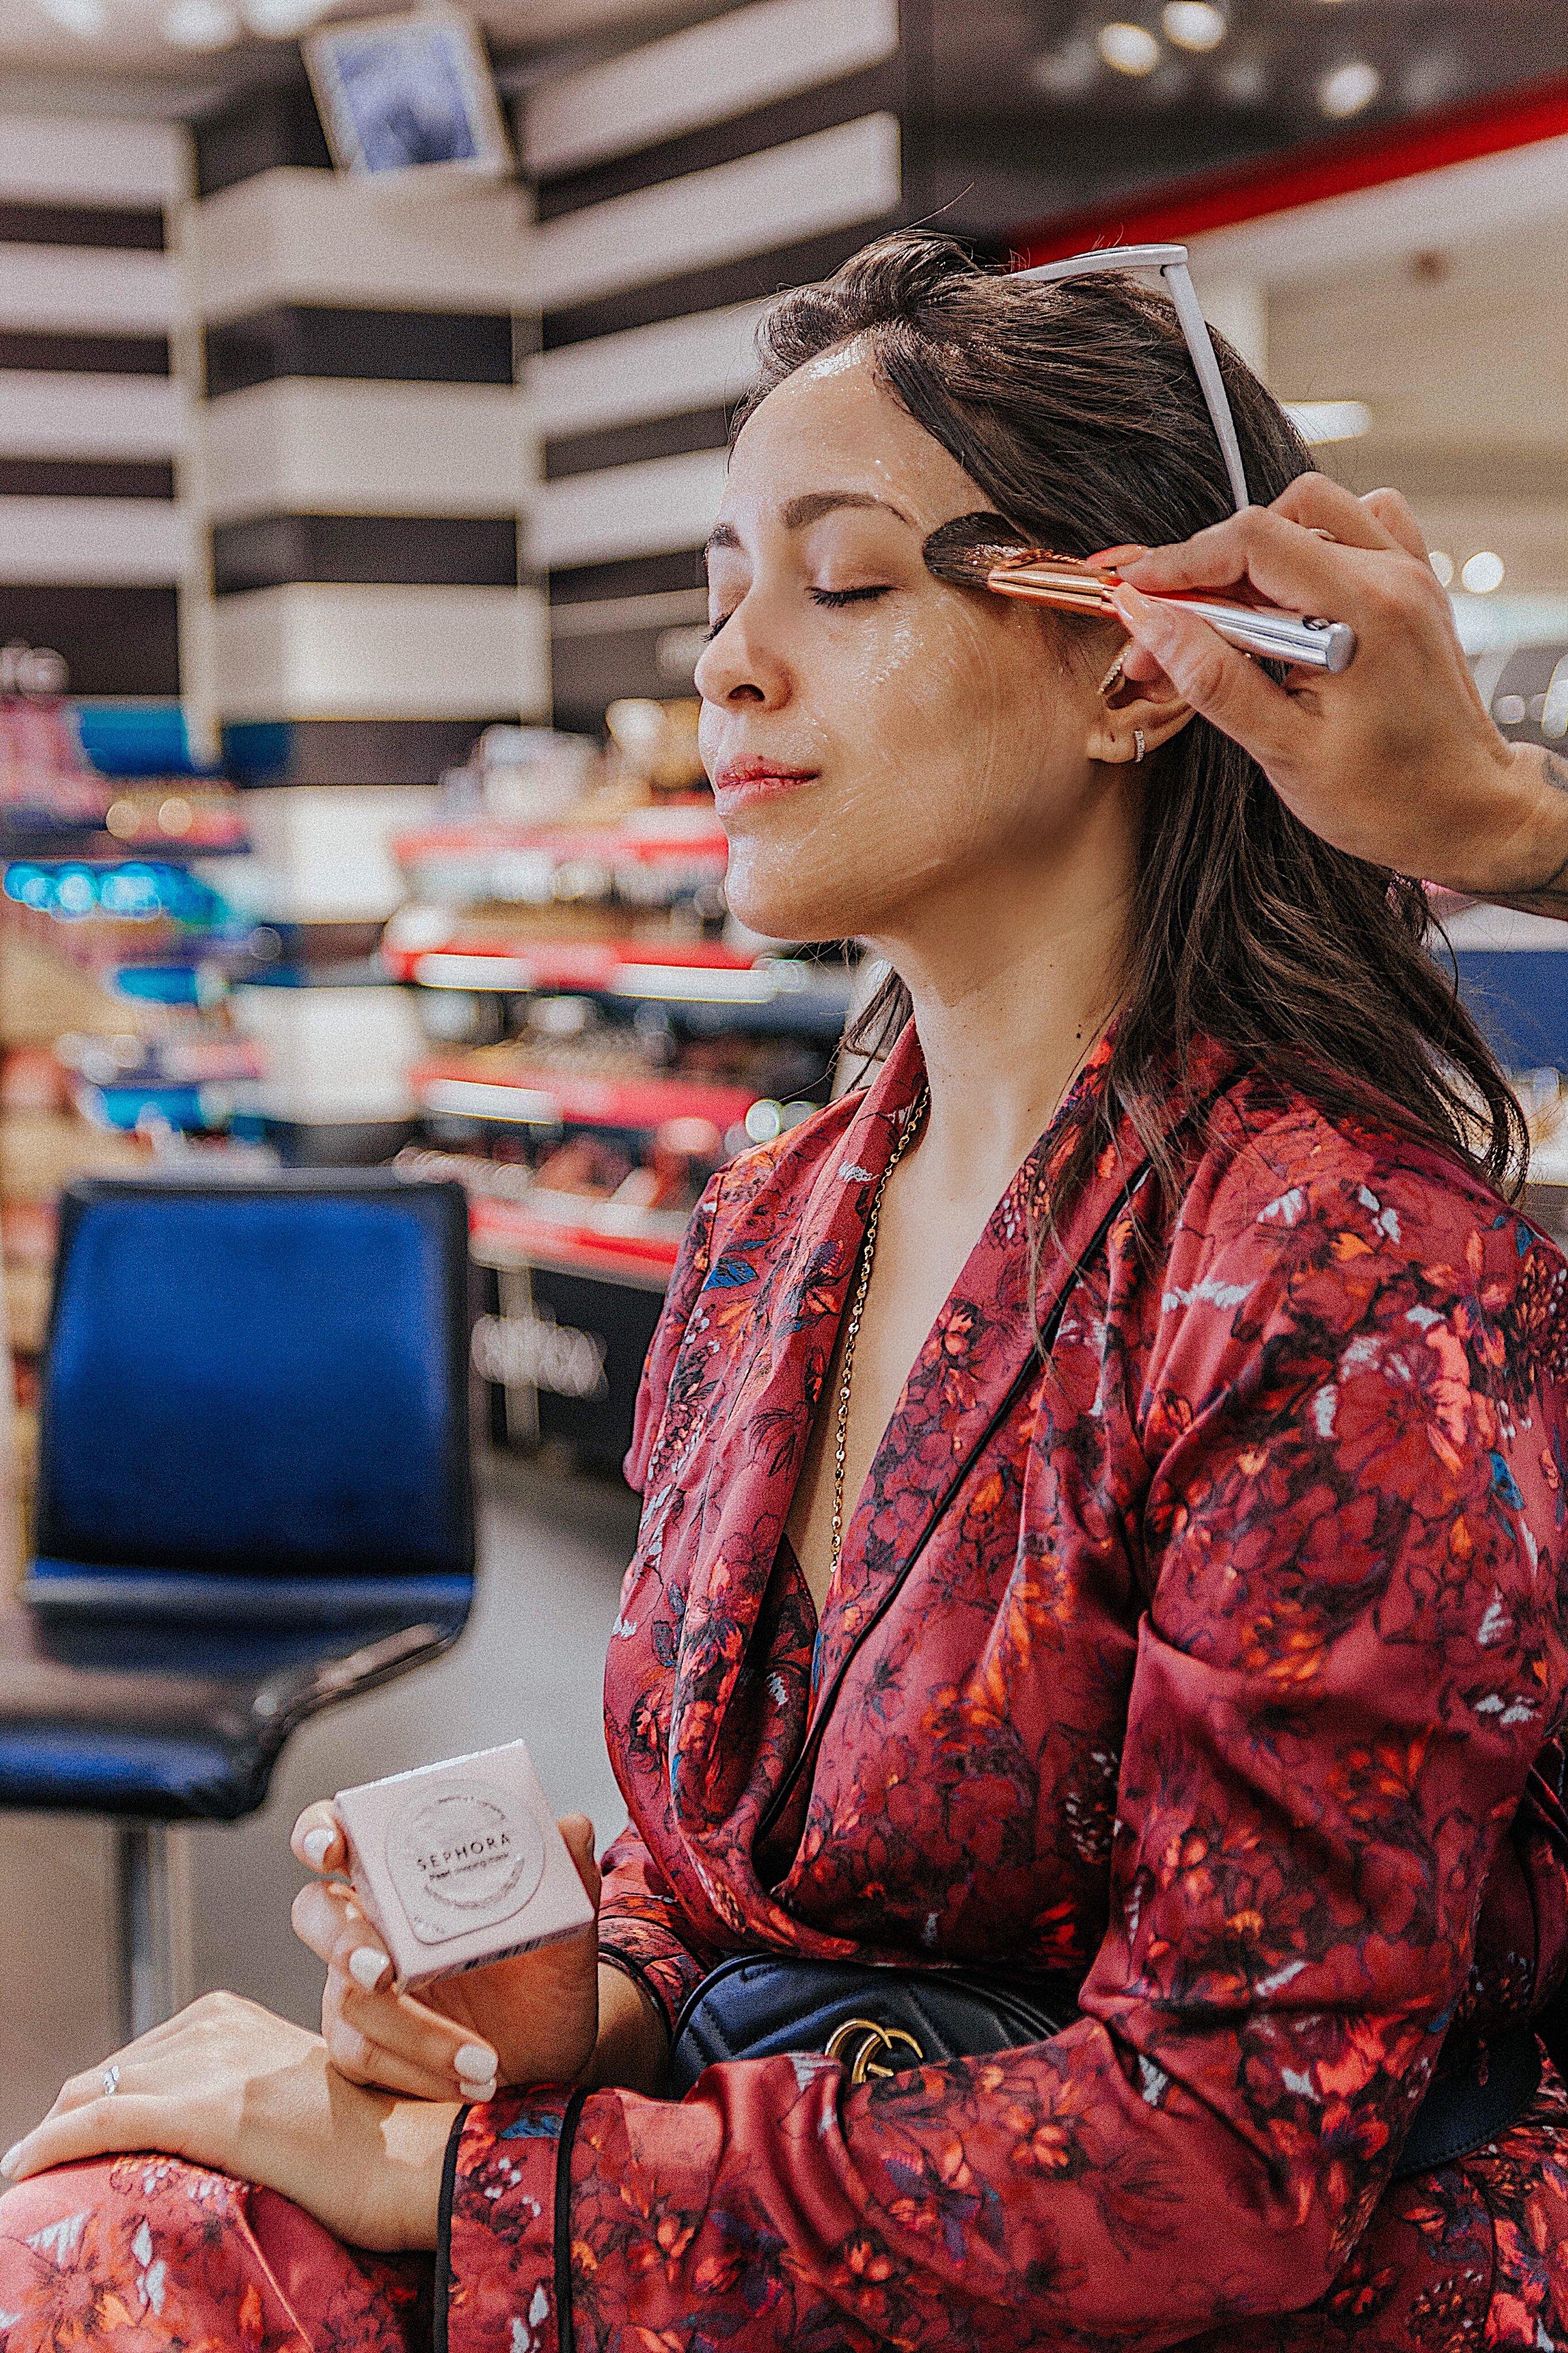 Sephora inside JCPenny Spanglishfashion (6).jpeg